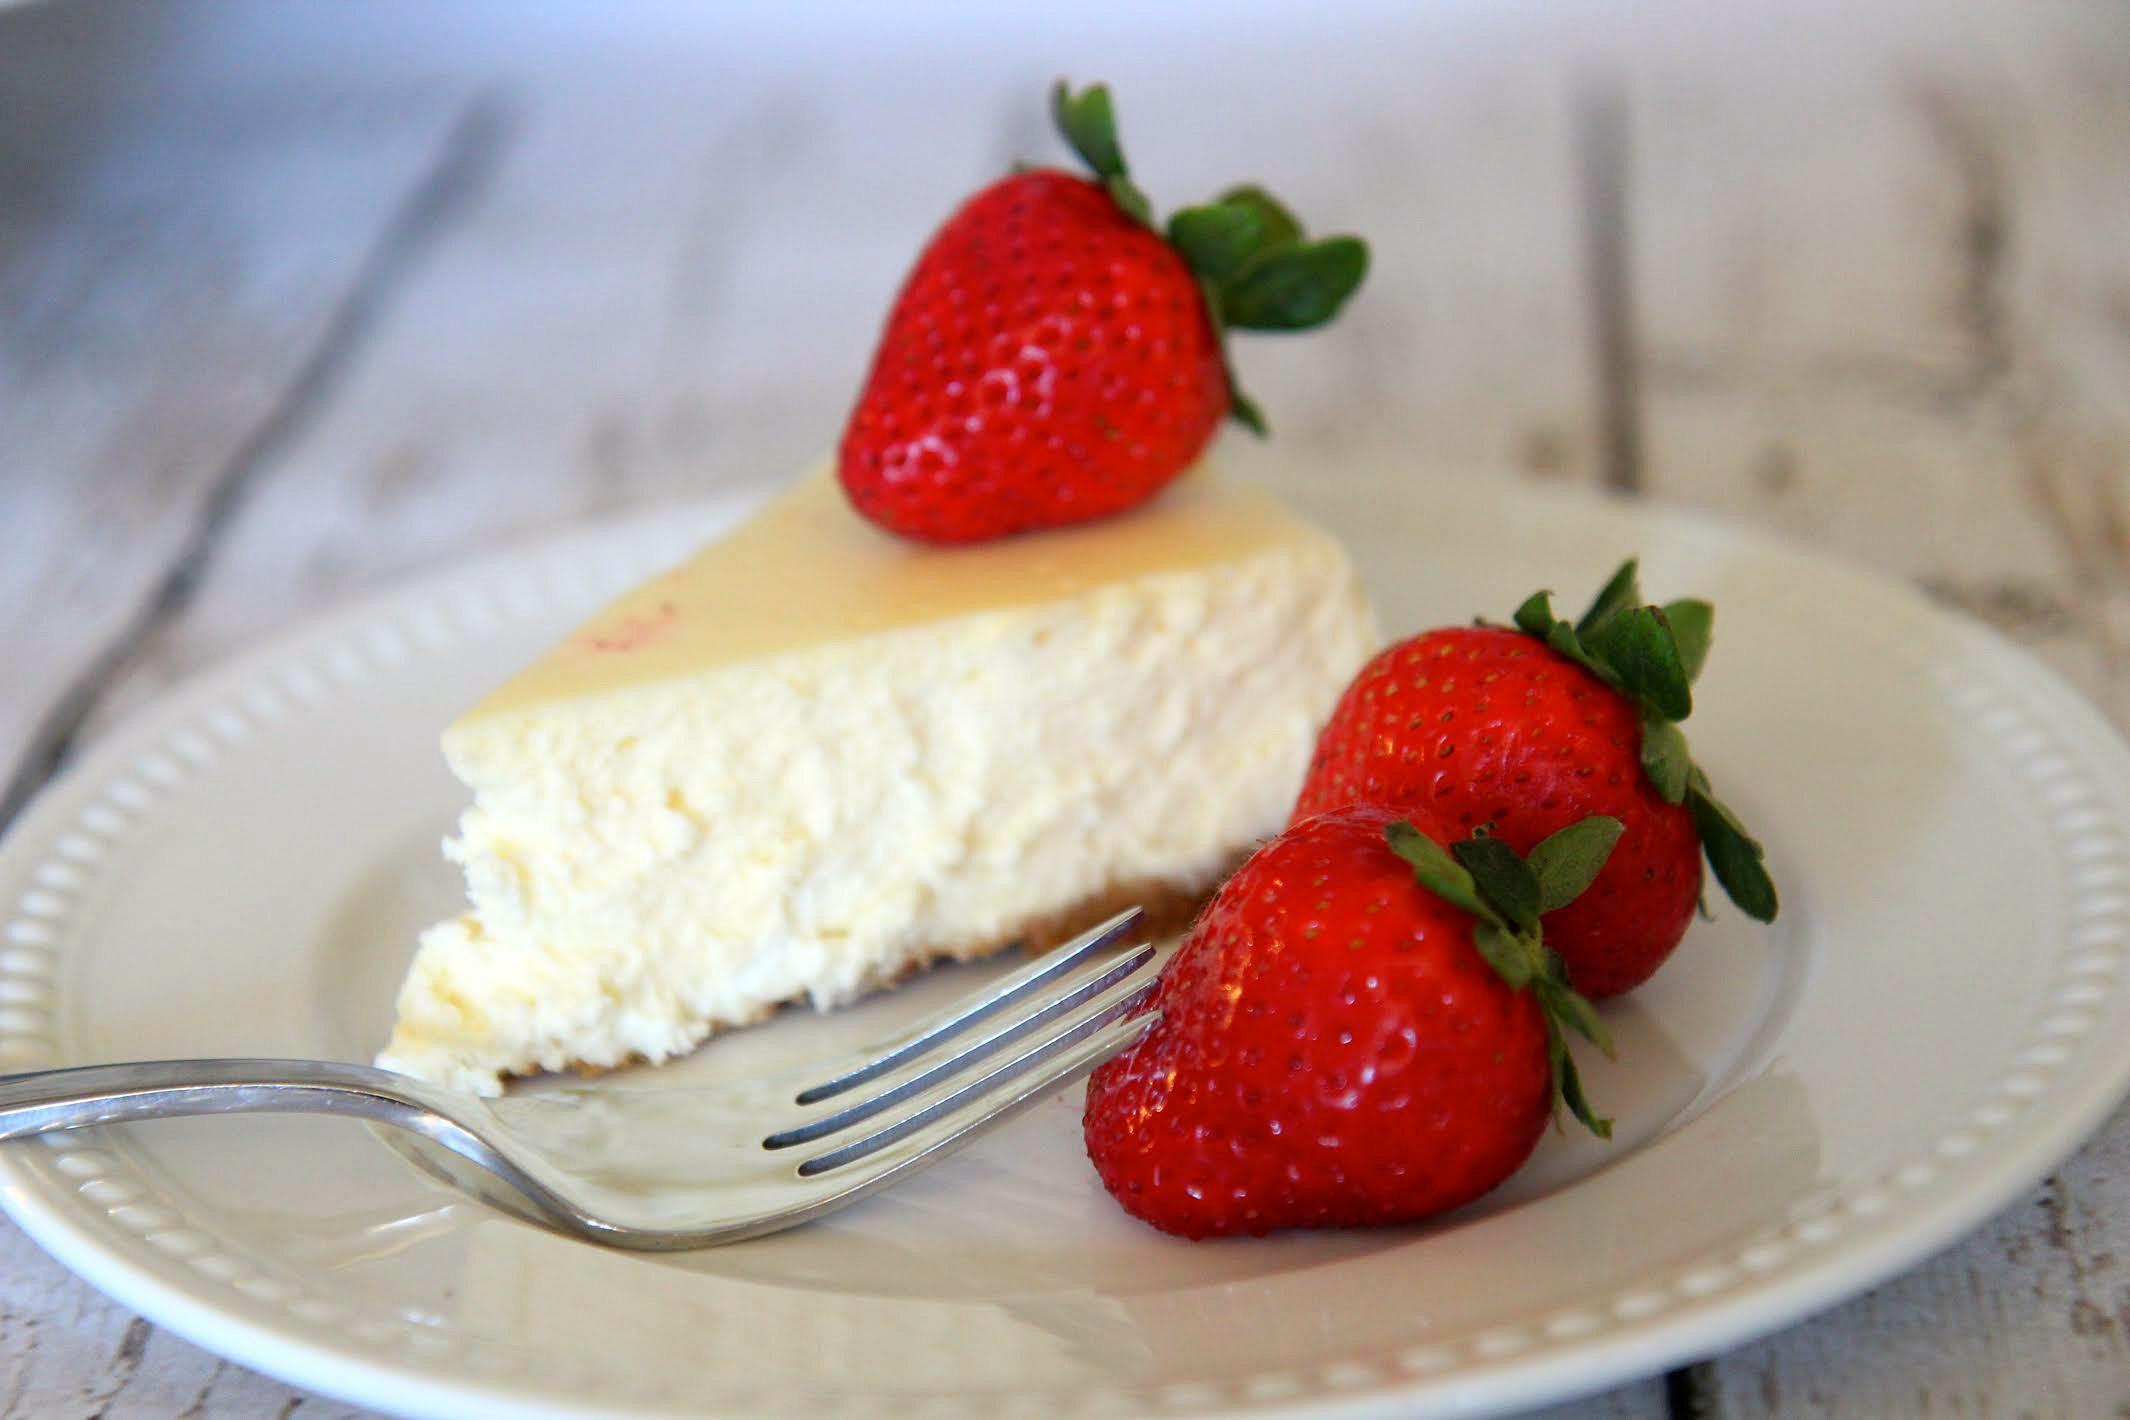 Plain Cheesecake with Strawberries